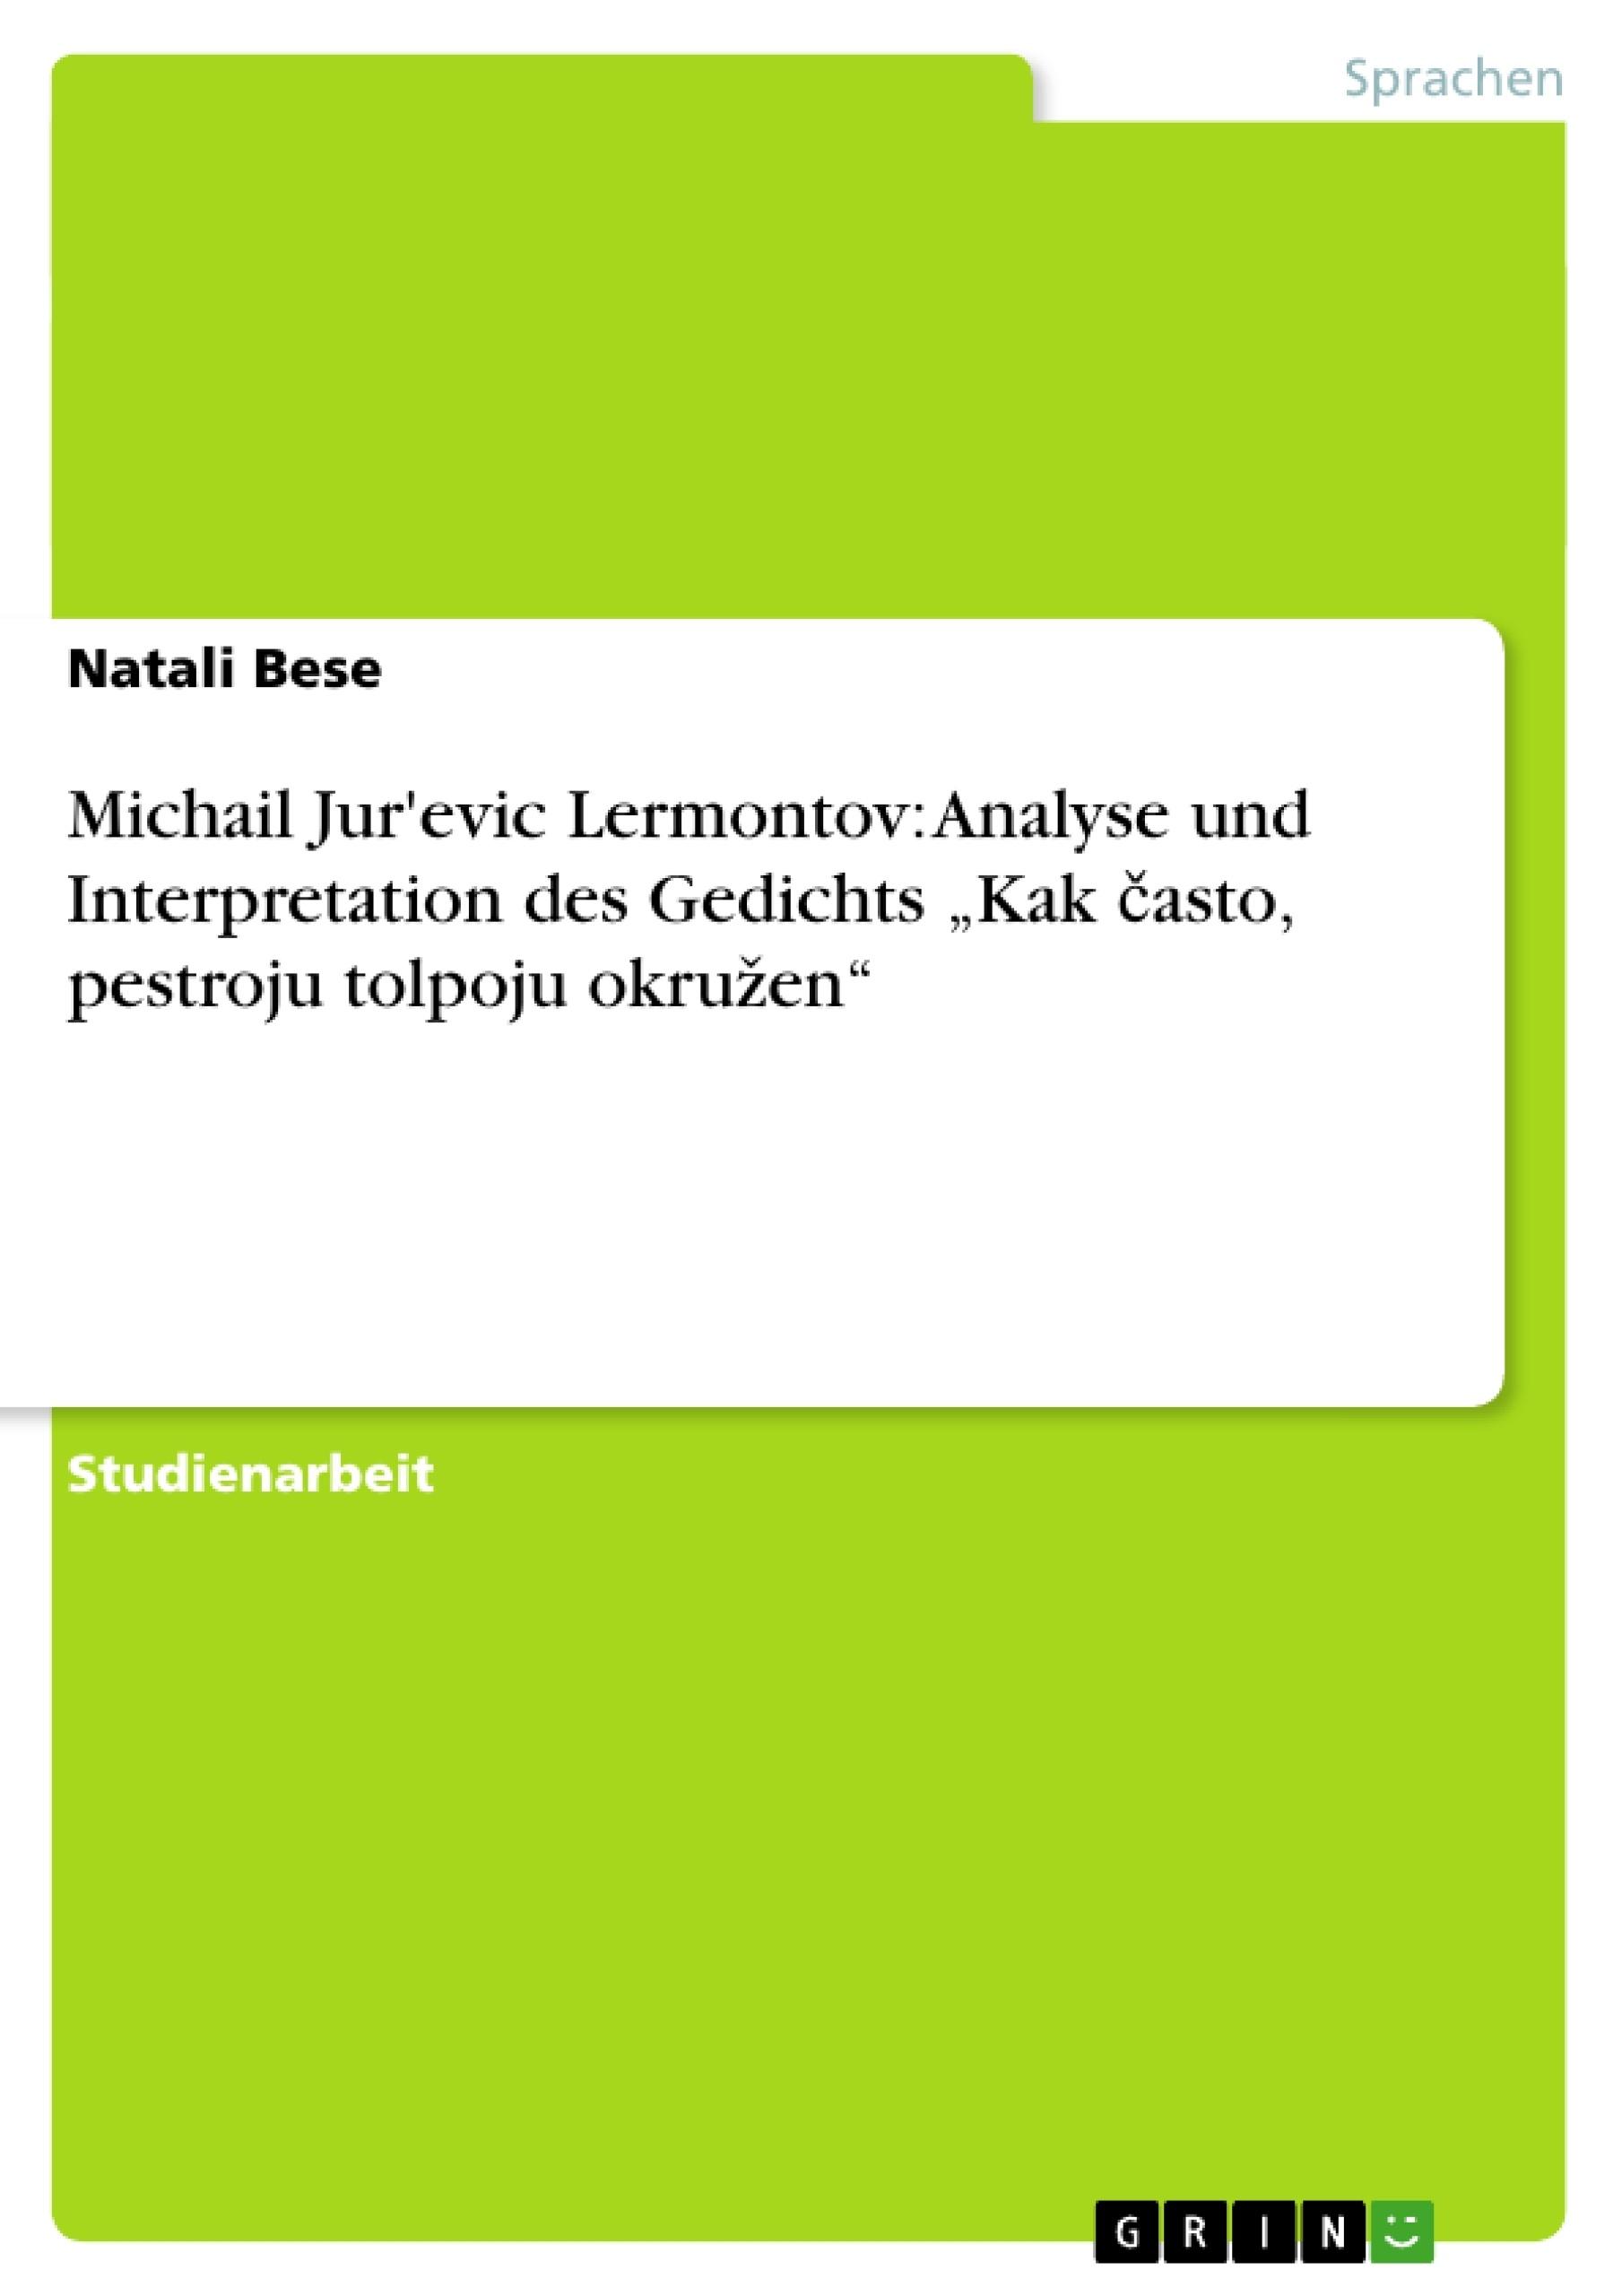 "Titel: Michail Jur'evic Lermontov: Analyse und Interpretation des Gedichts ""Kak často, pestroju tolpoju okružen"""